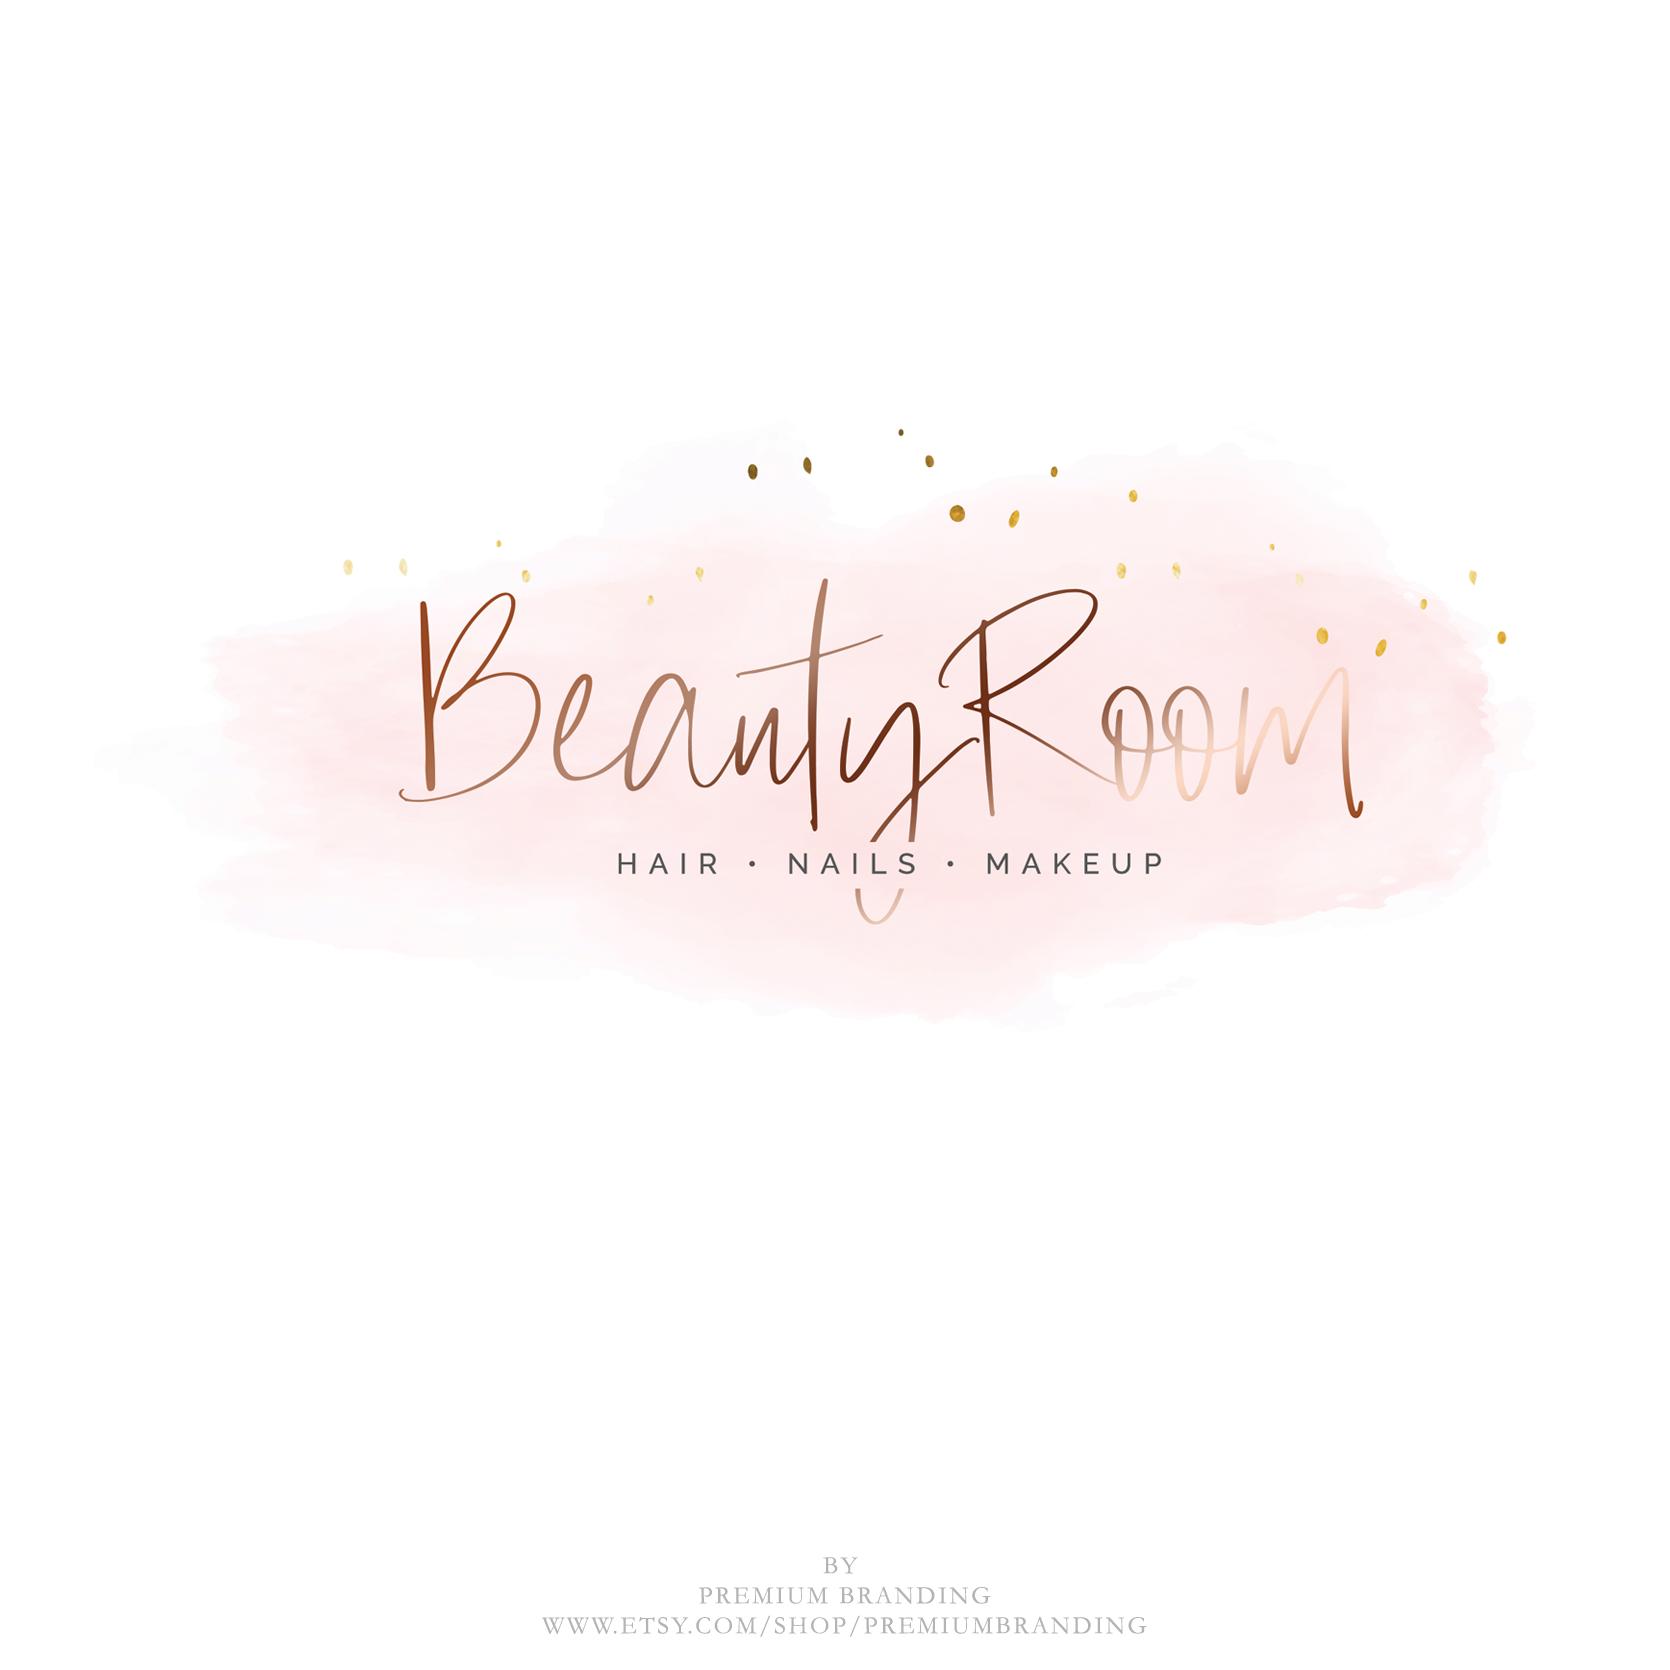 Pin De Ilmadhareta Sri En Logo Designs Nombres De Salones De Belleza Logo De Belleza Logo De Artista De Maquillaje